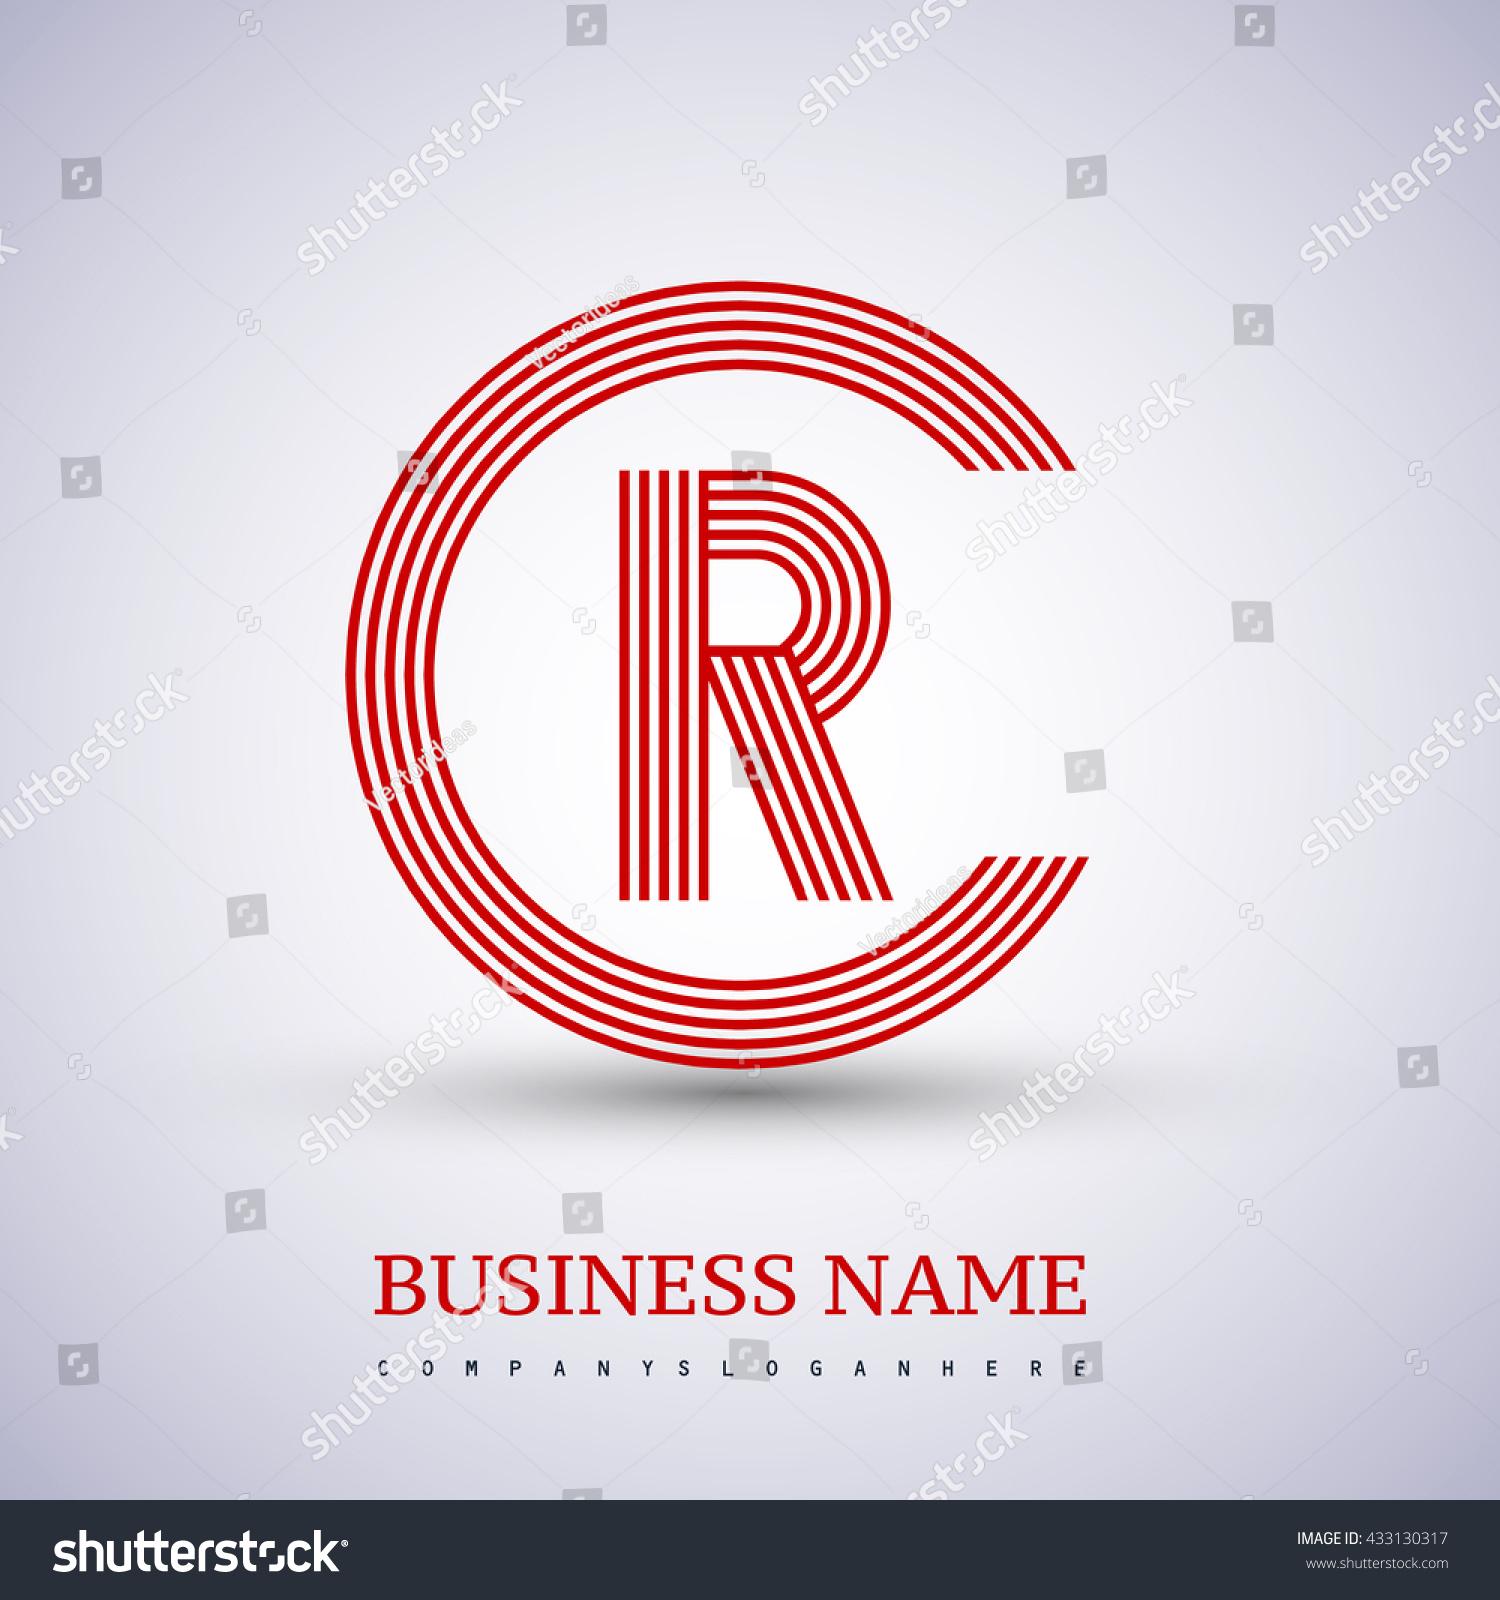 Letter Rc Cr Linked Logo Design Stock Vector Royalty Free